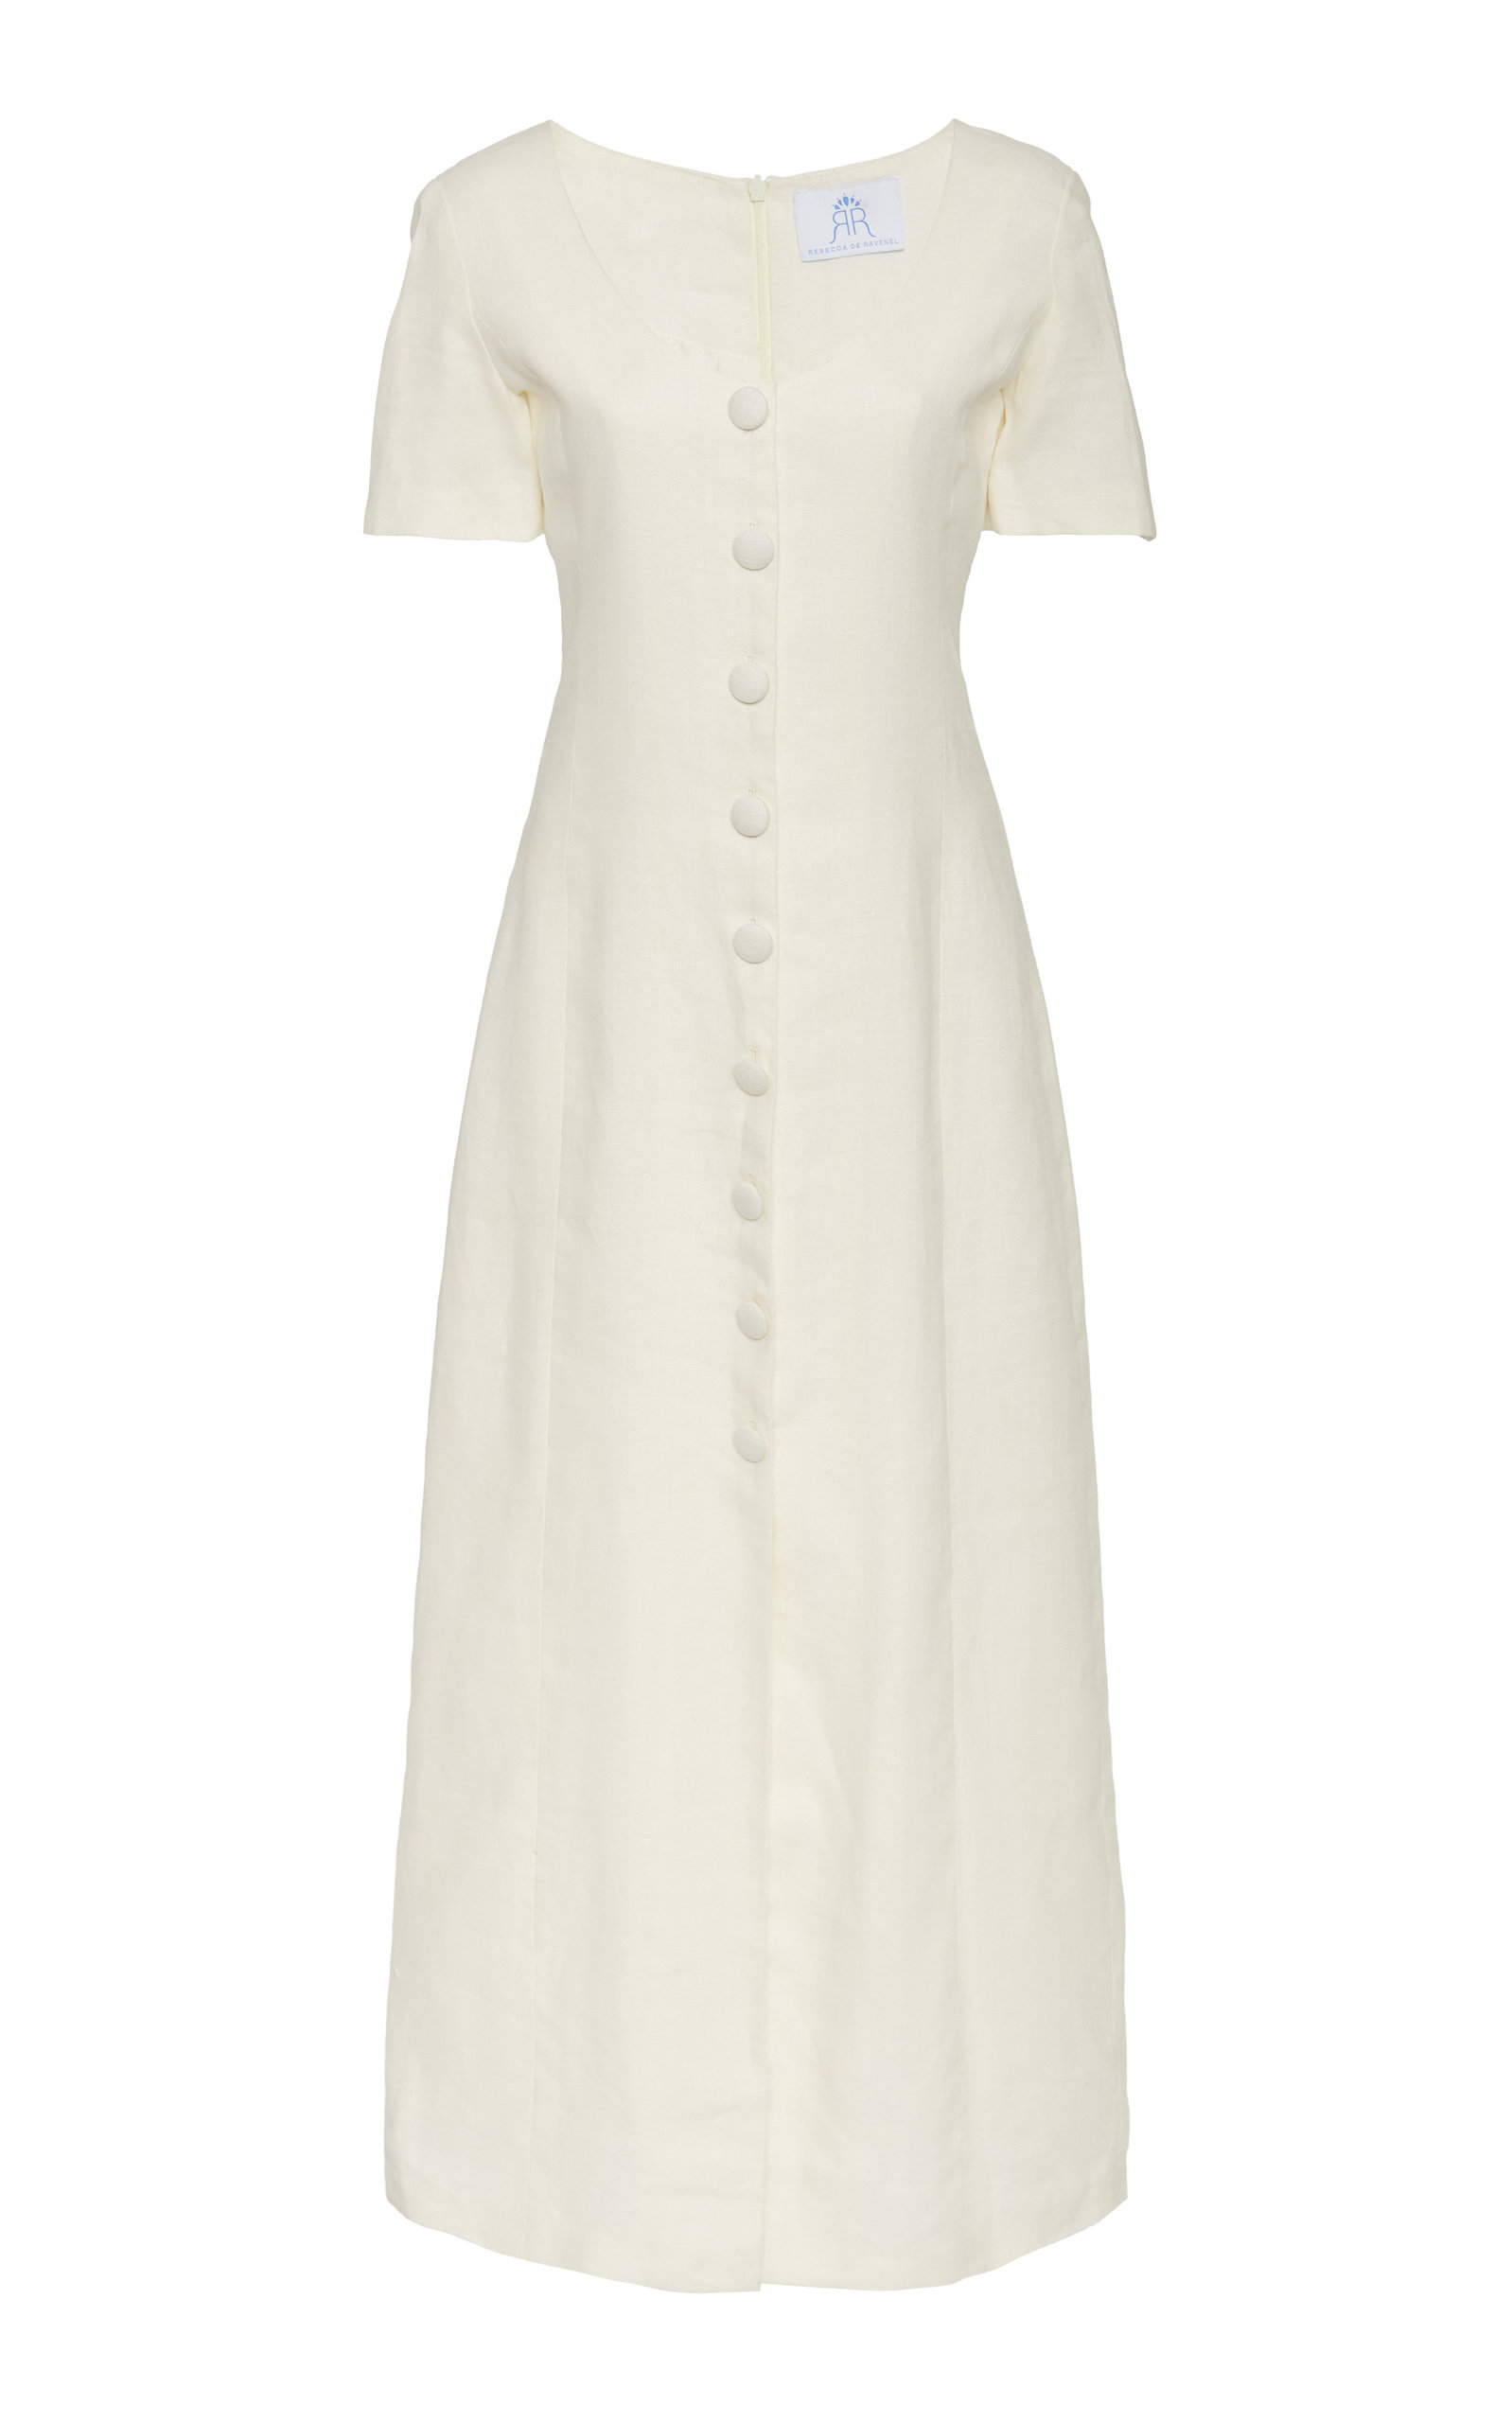 Buy Rebecca de Ravenel Lots Of Love Button-Front Linen Midi Dress online, shop Rebecca de Ravenel at the best price